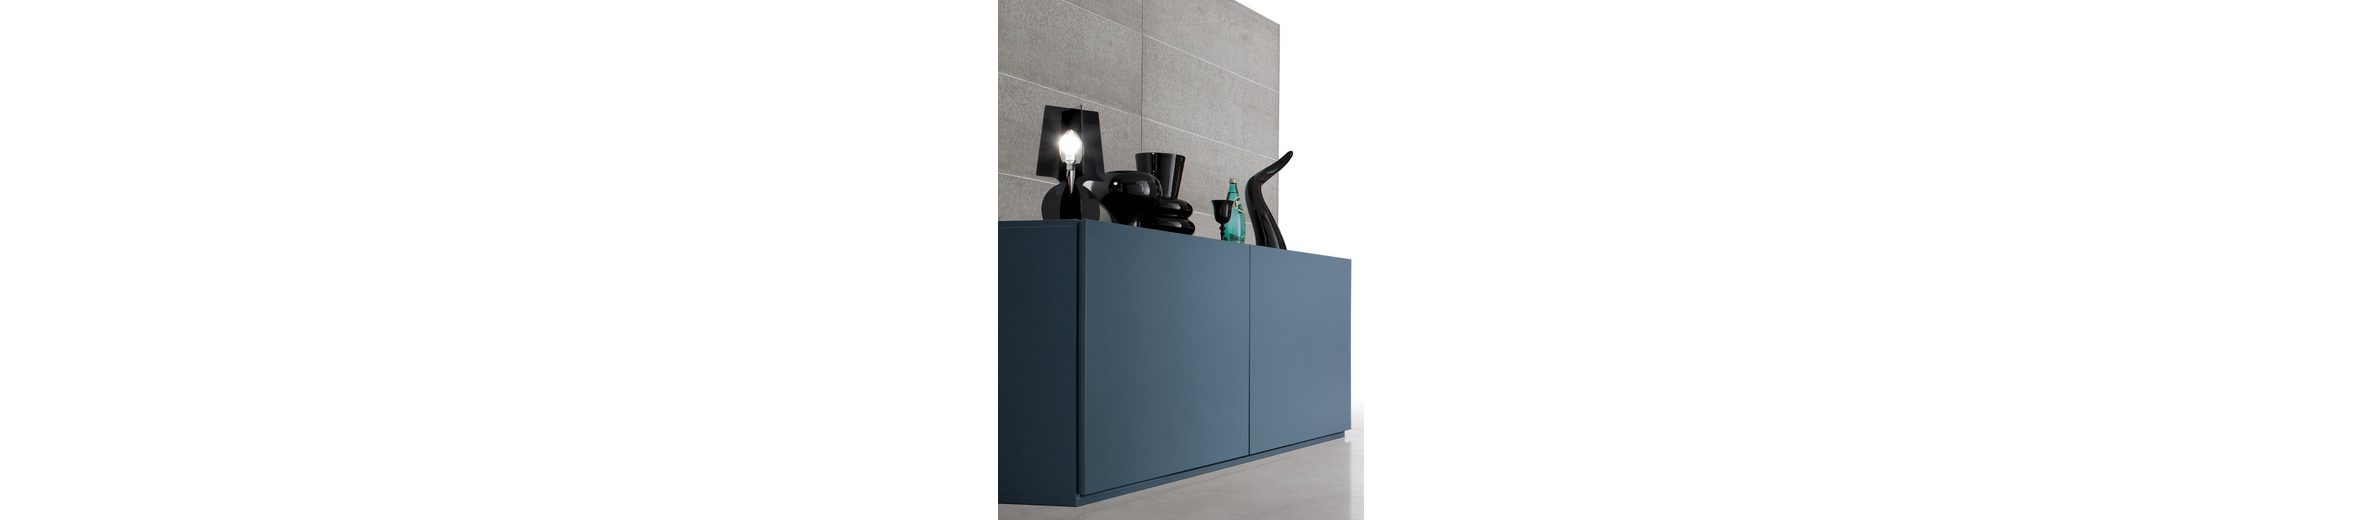 santa lucia Sideboard, Breite 183,3 cm